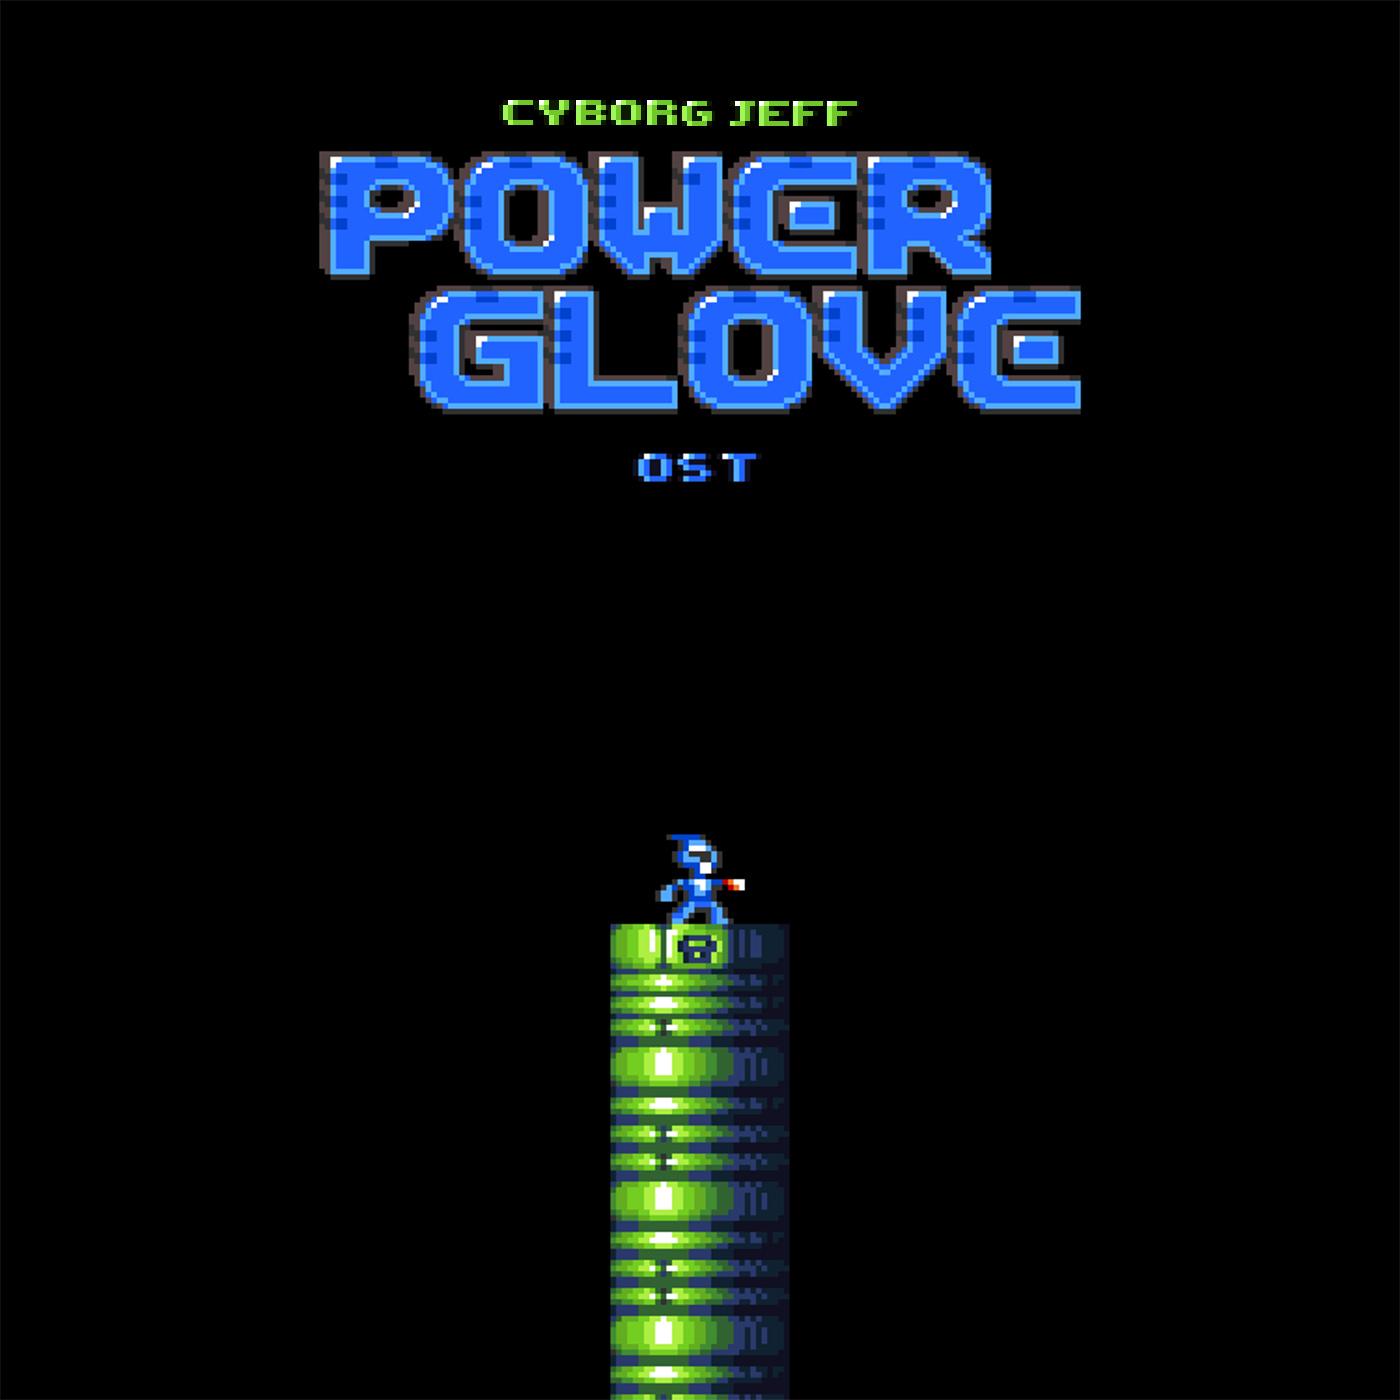 Cyborg Jeff - Powerglove - Amiga - OST